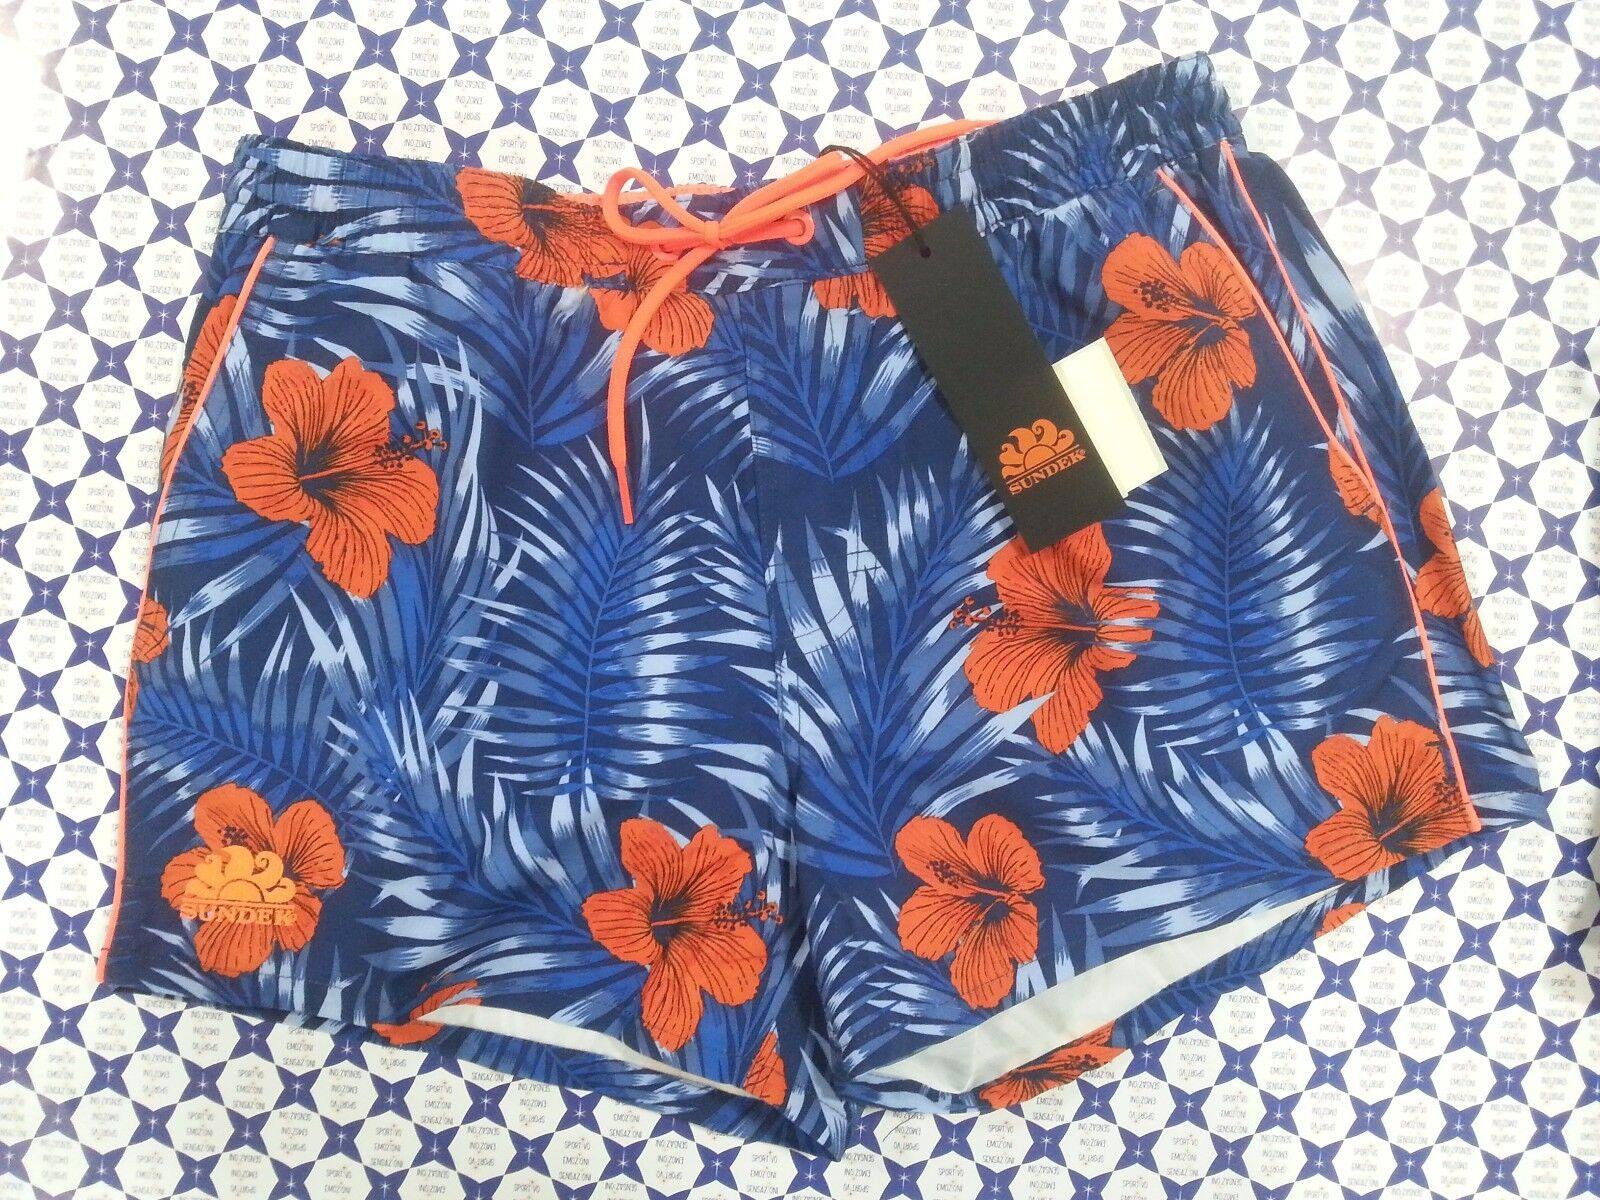 Costume Boxer SUNDEK Piping Rosco Floreale   SCONTATO  Mare Piscina blue Arancio